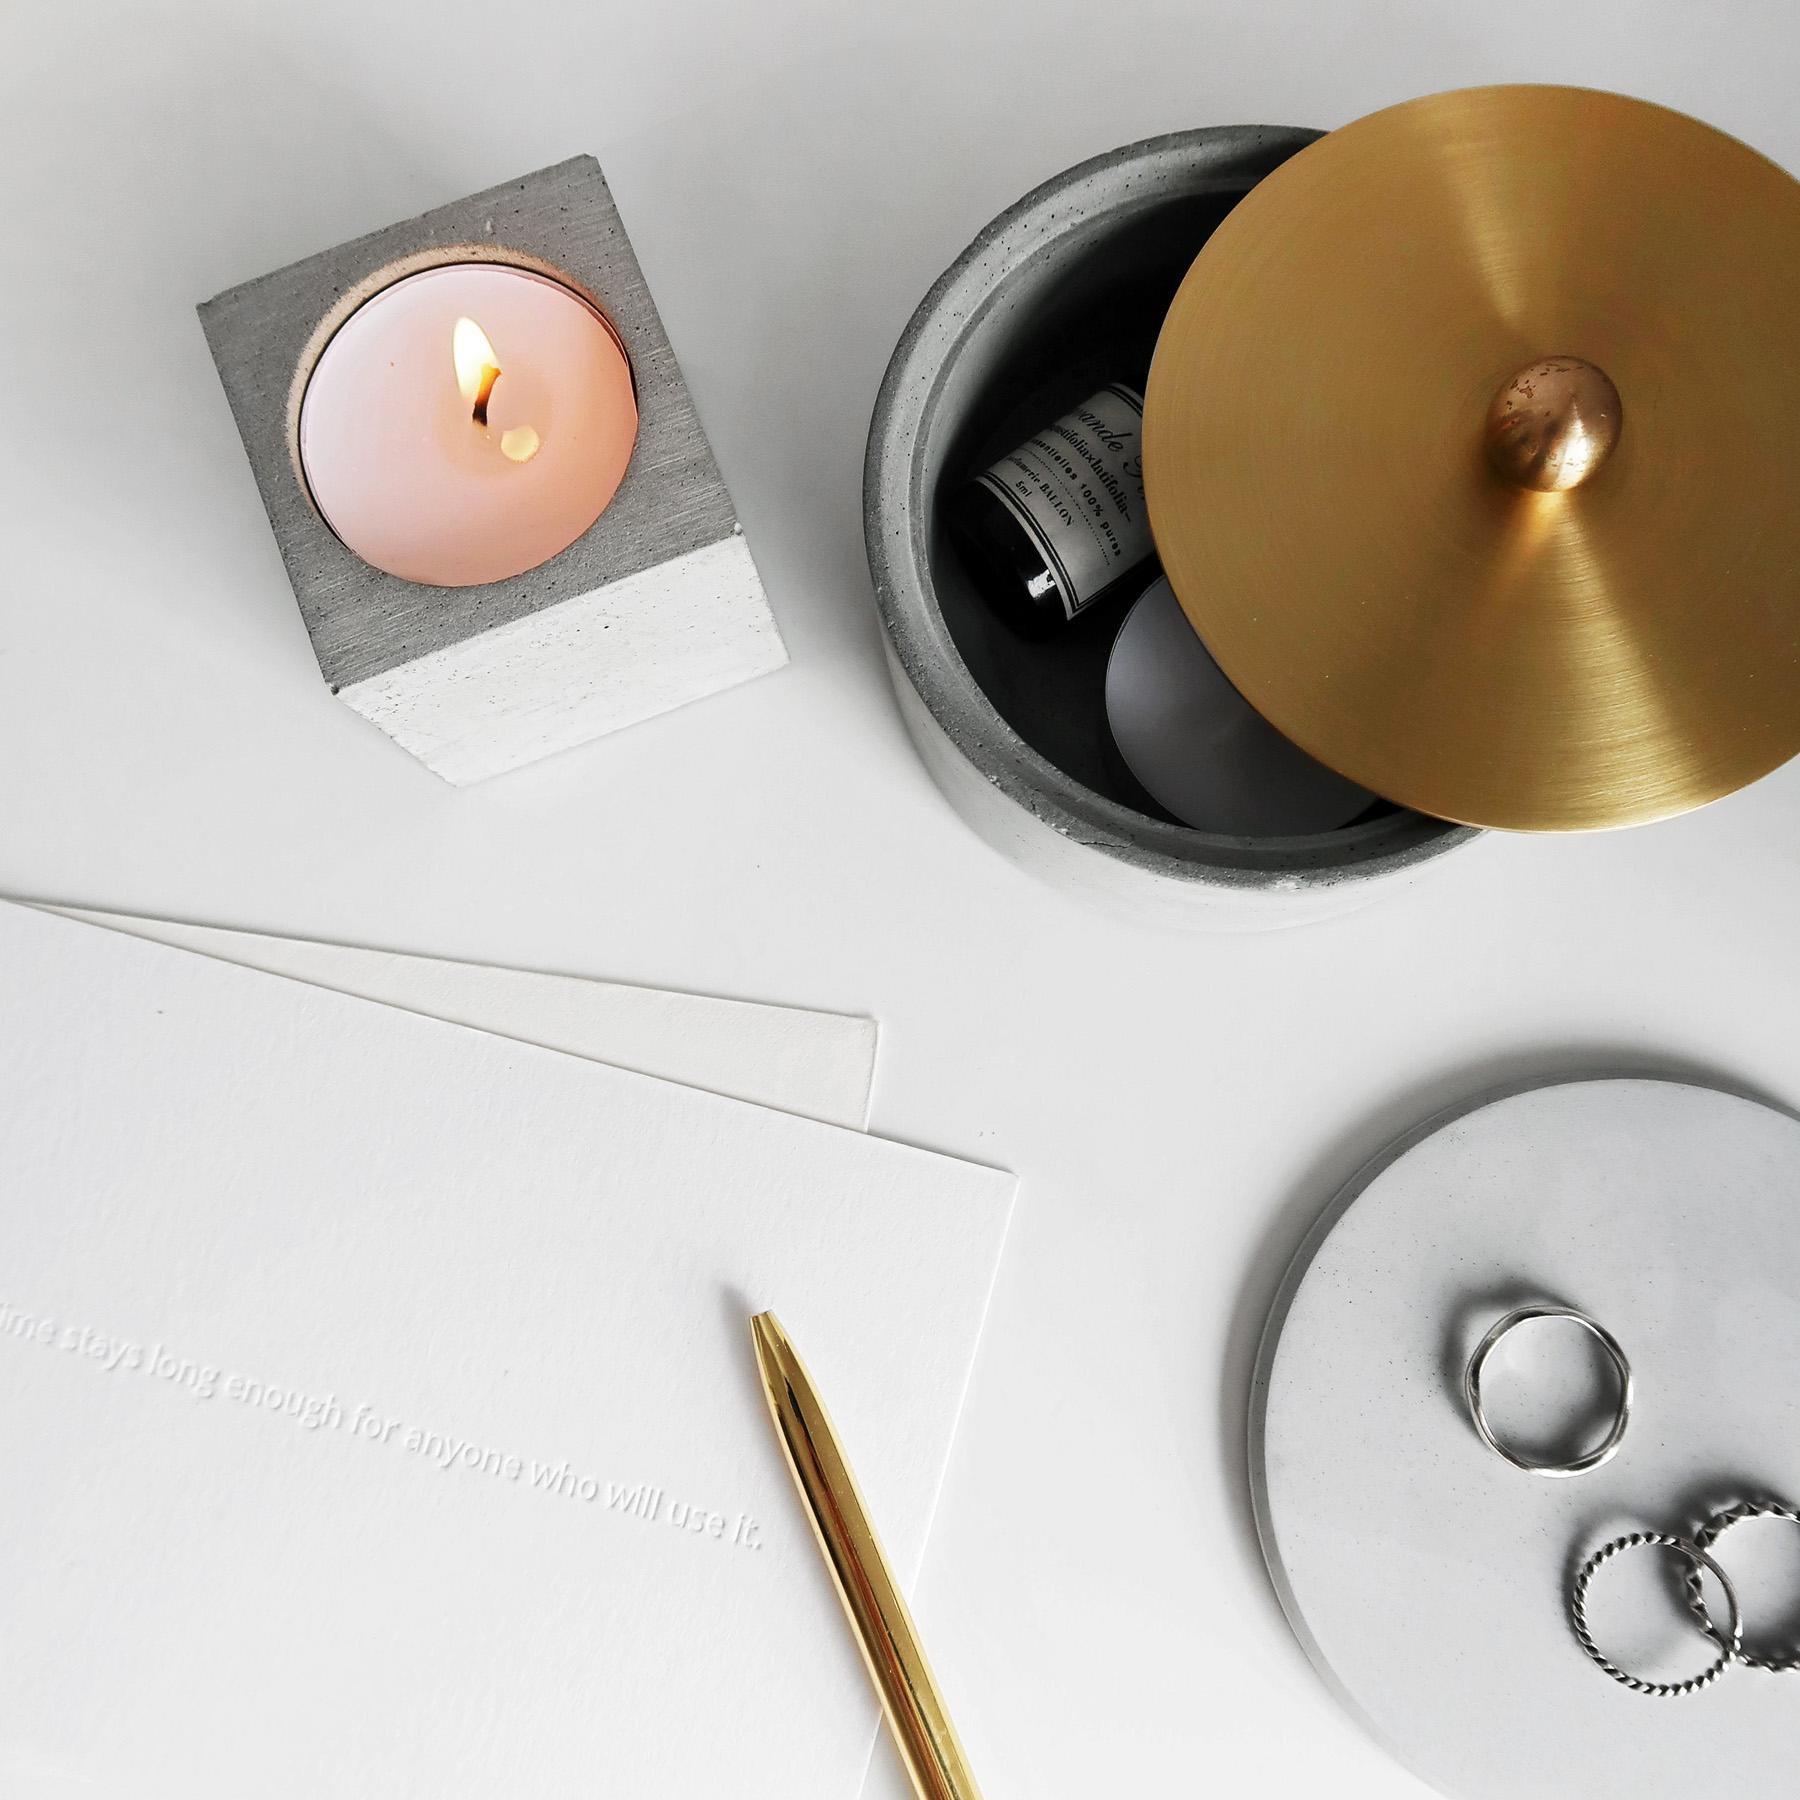 MINI CUBE 小方磚水泥蠟燭・飾品收納・空氣鳳梨座